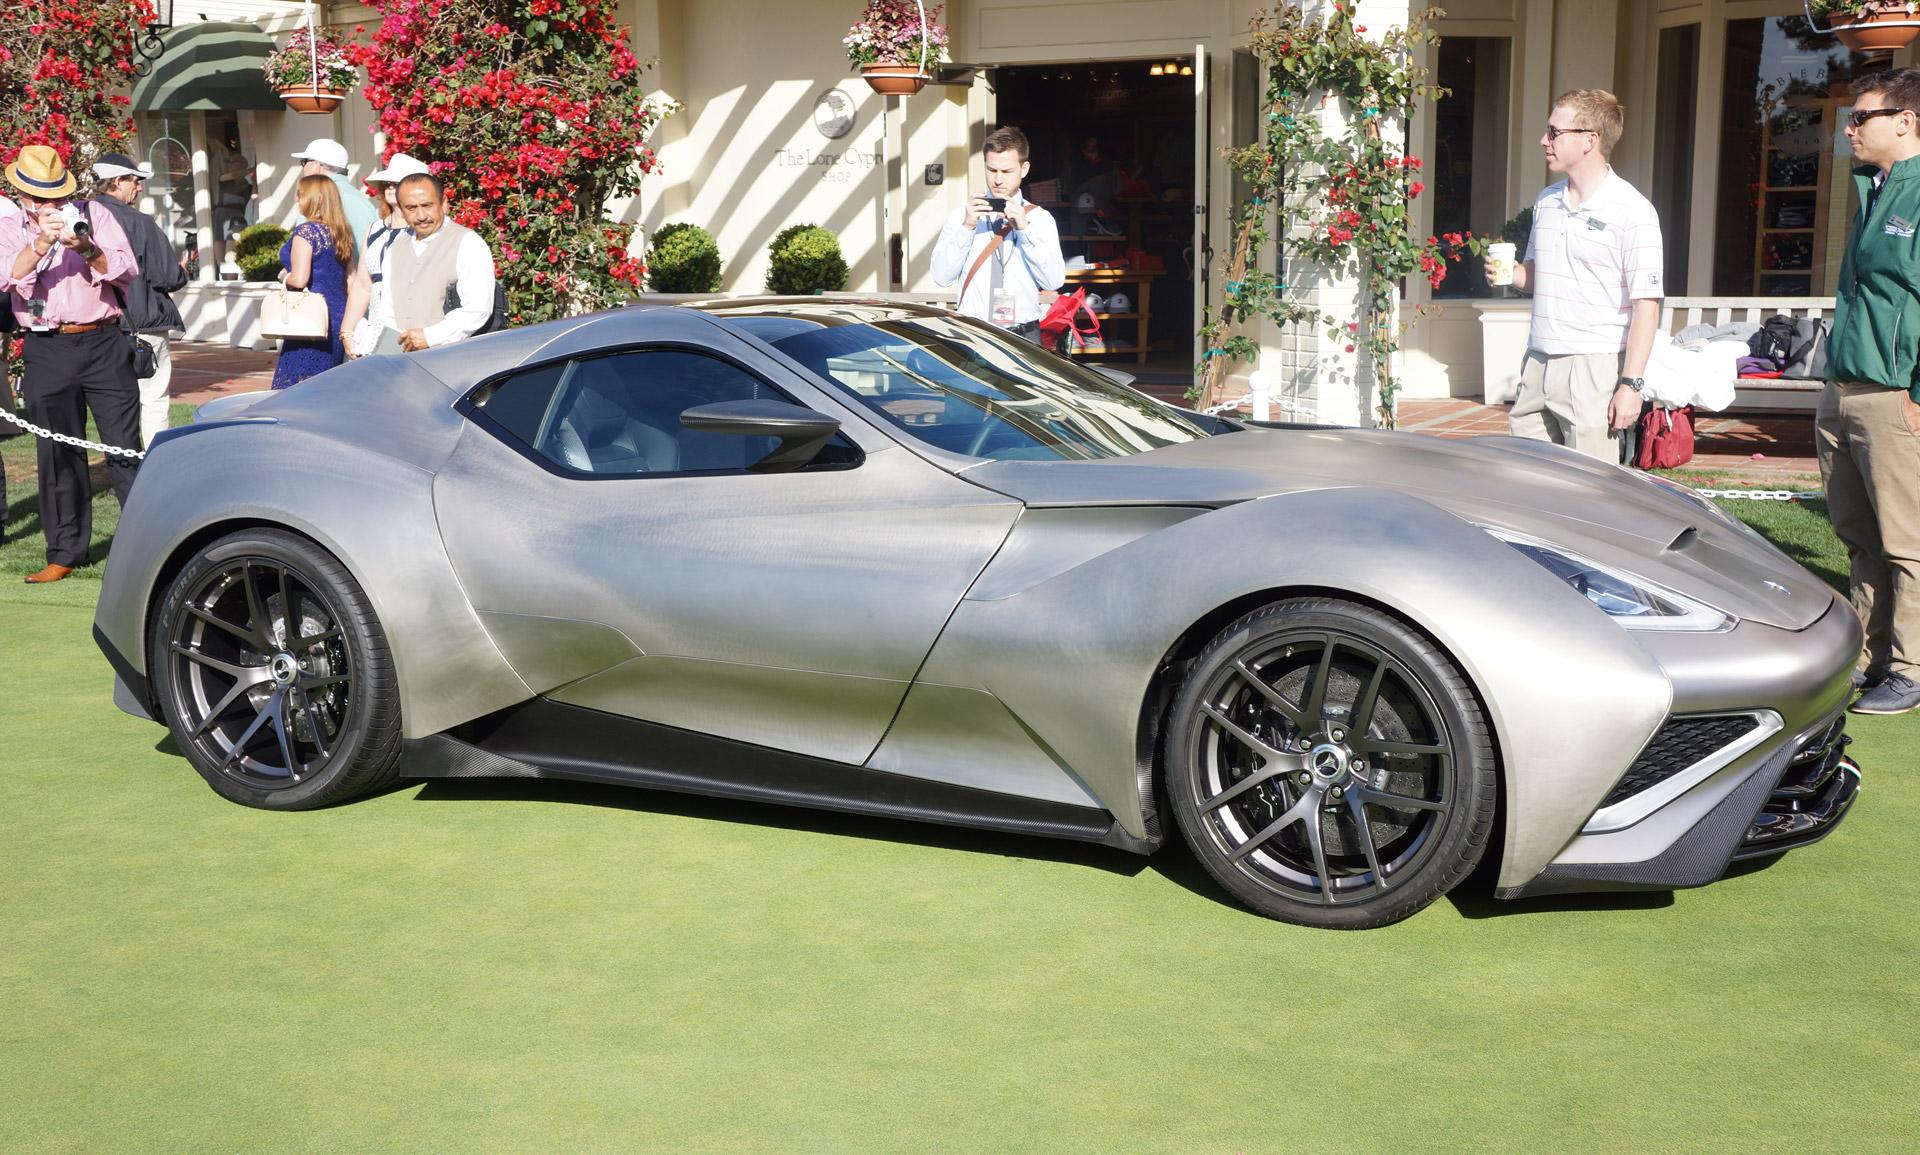 Titanium Bodied Icona Vulcano Supercar Debuts At Pebble